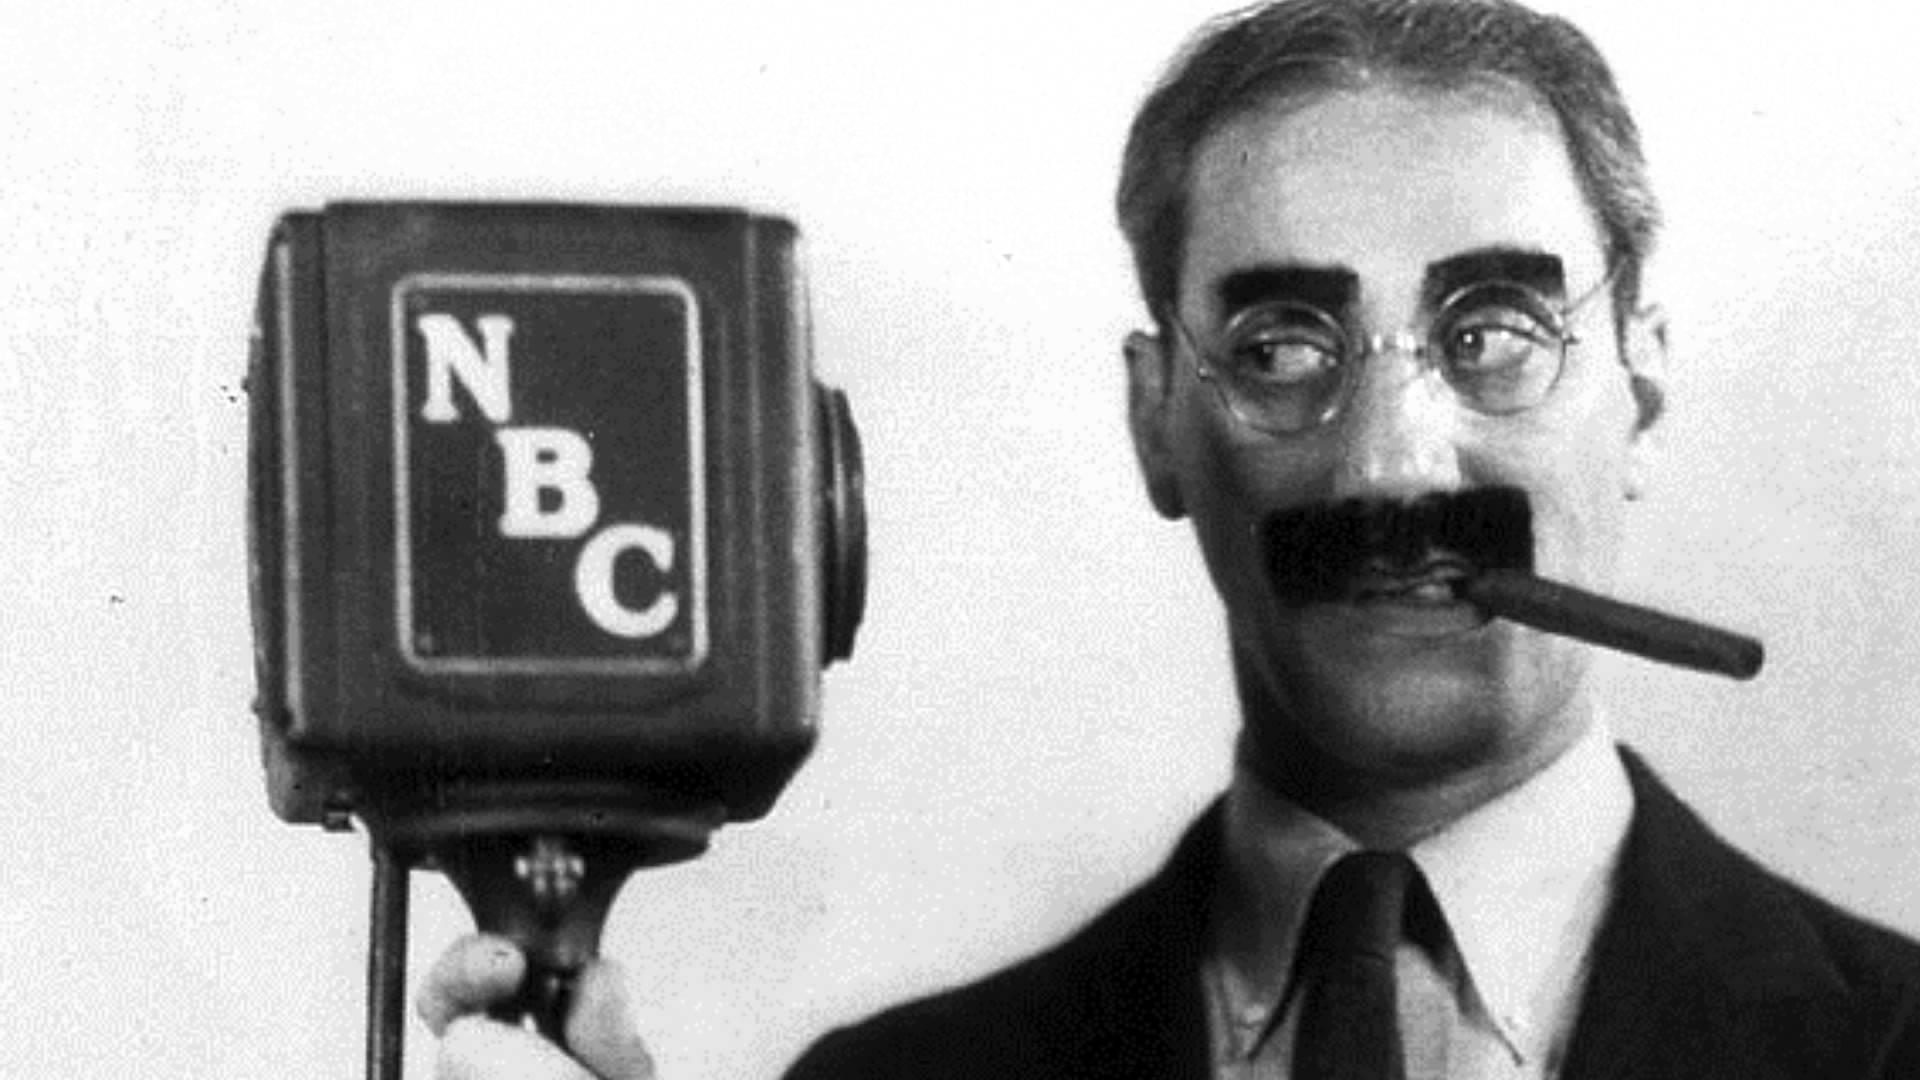 Groucho Marx Widescreen